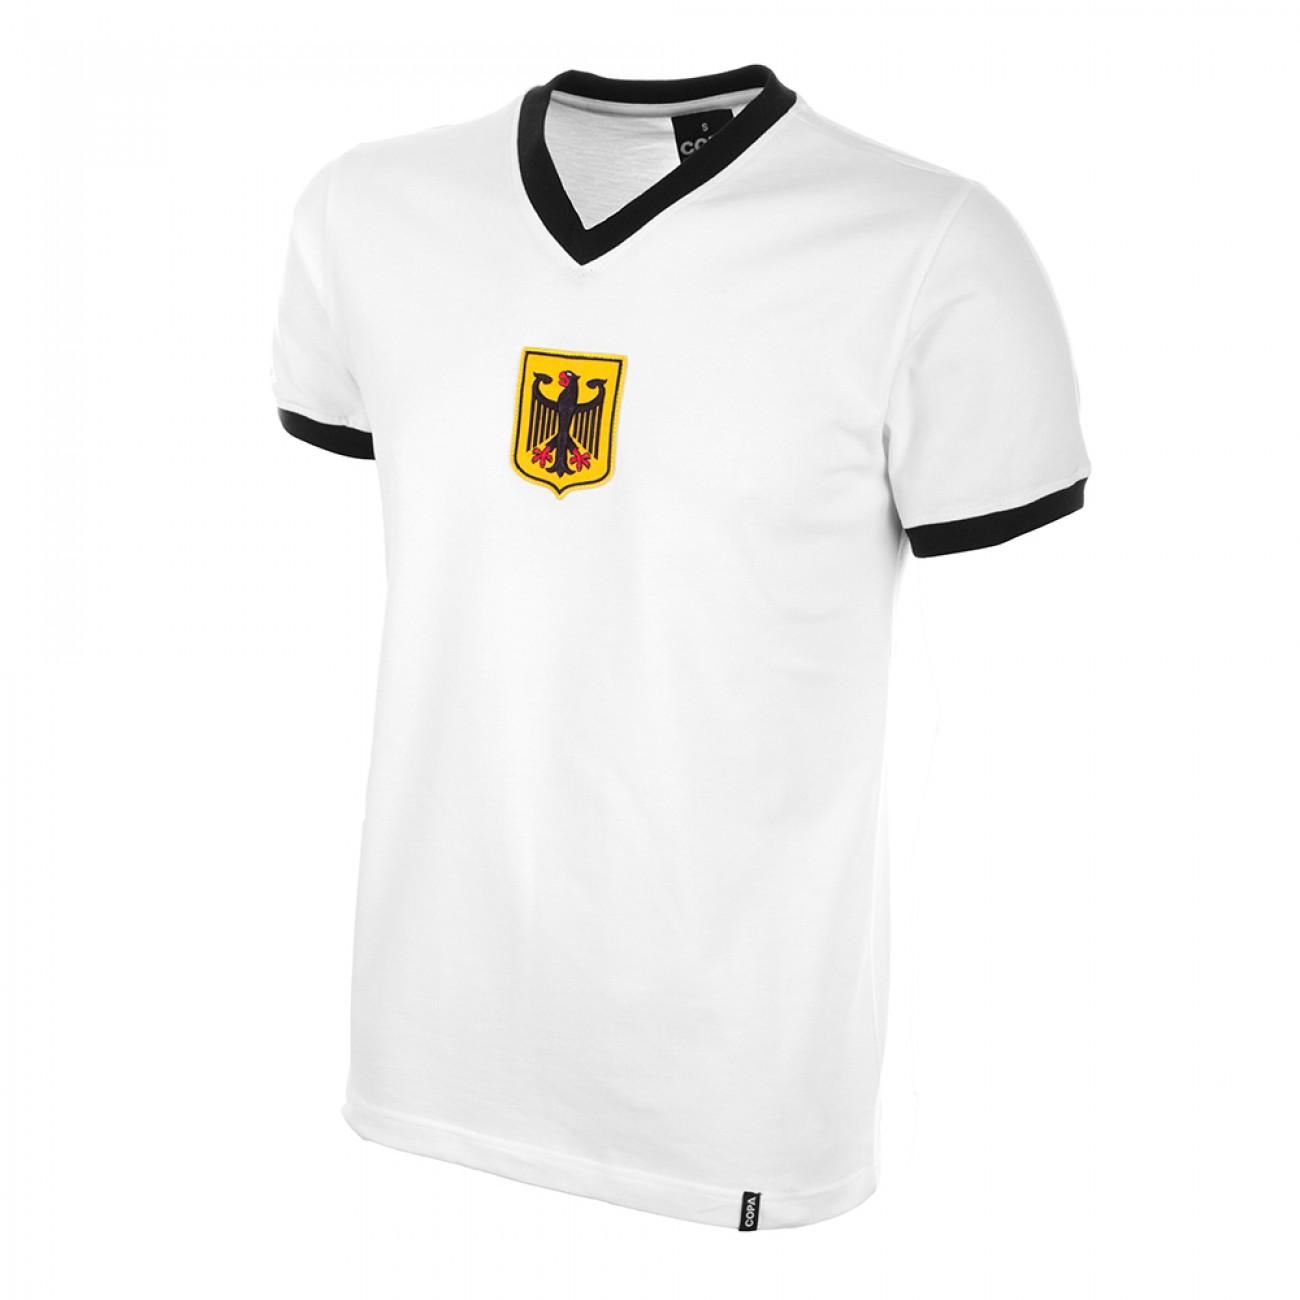 http://www.retrofootball.es/ropa-de-futbol/camiseta-alemania-a-os-70-rfa.html